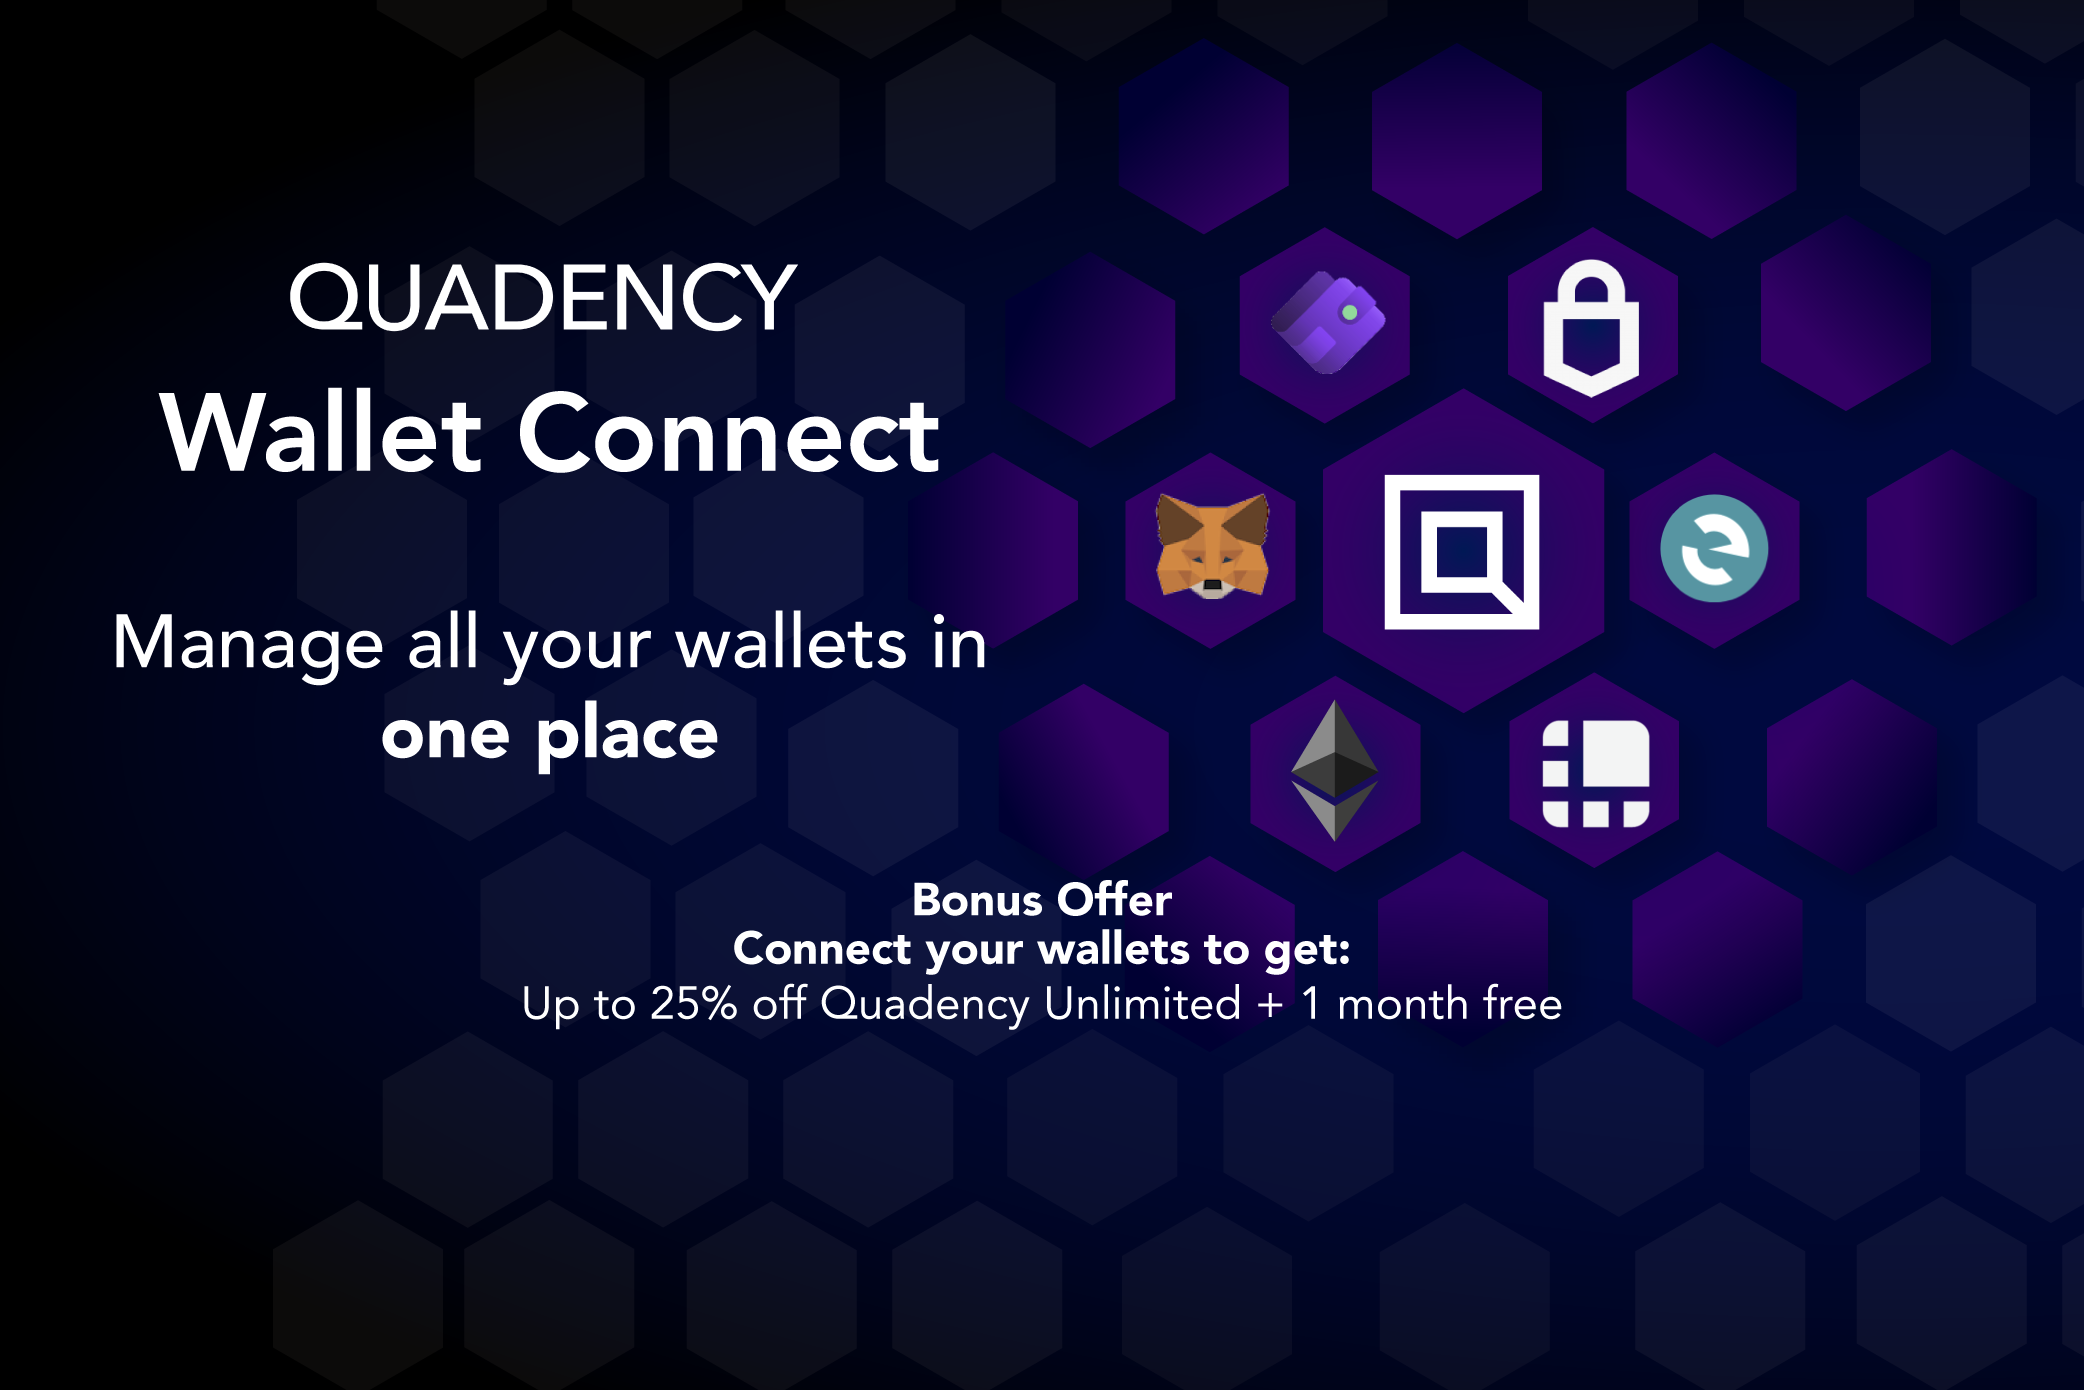 quadency-wallet-connect-bonus-offer